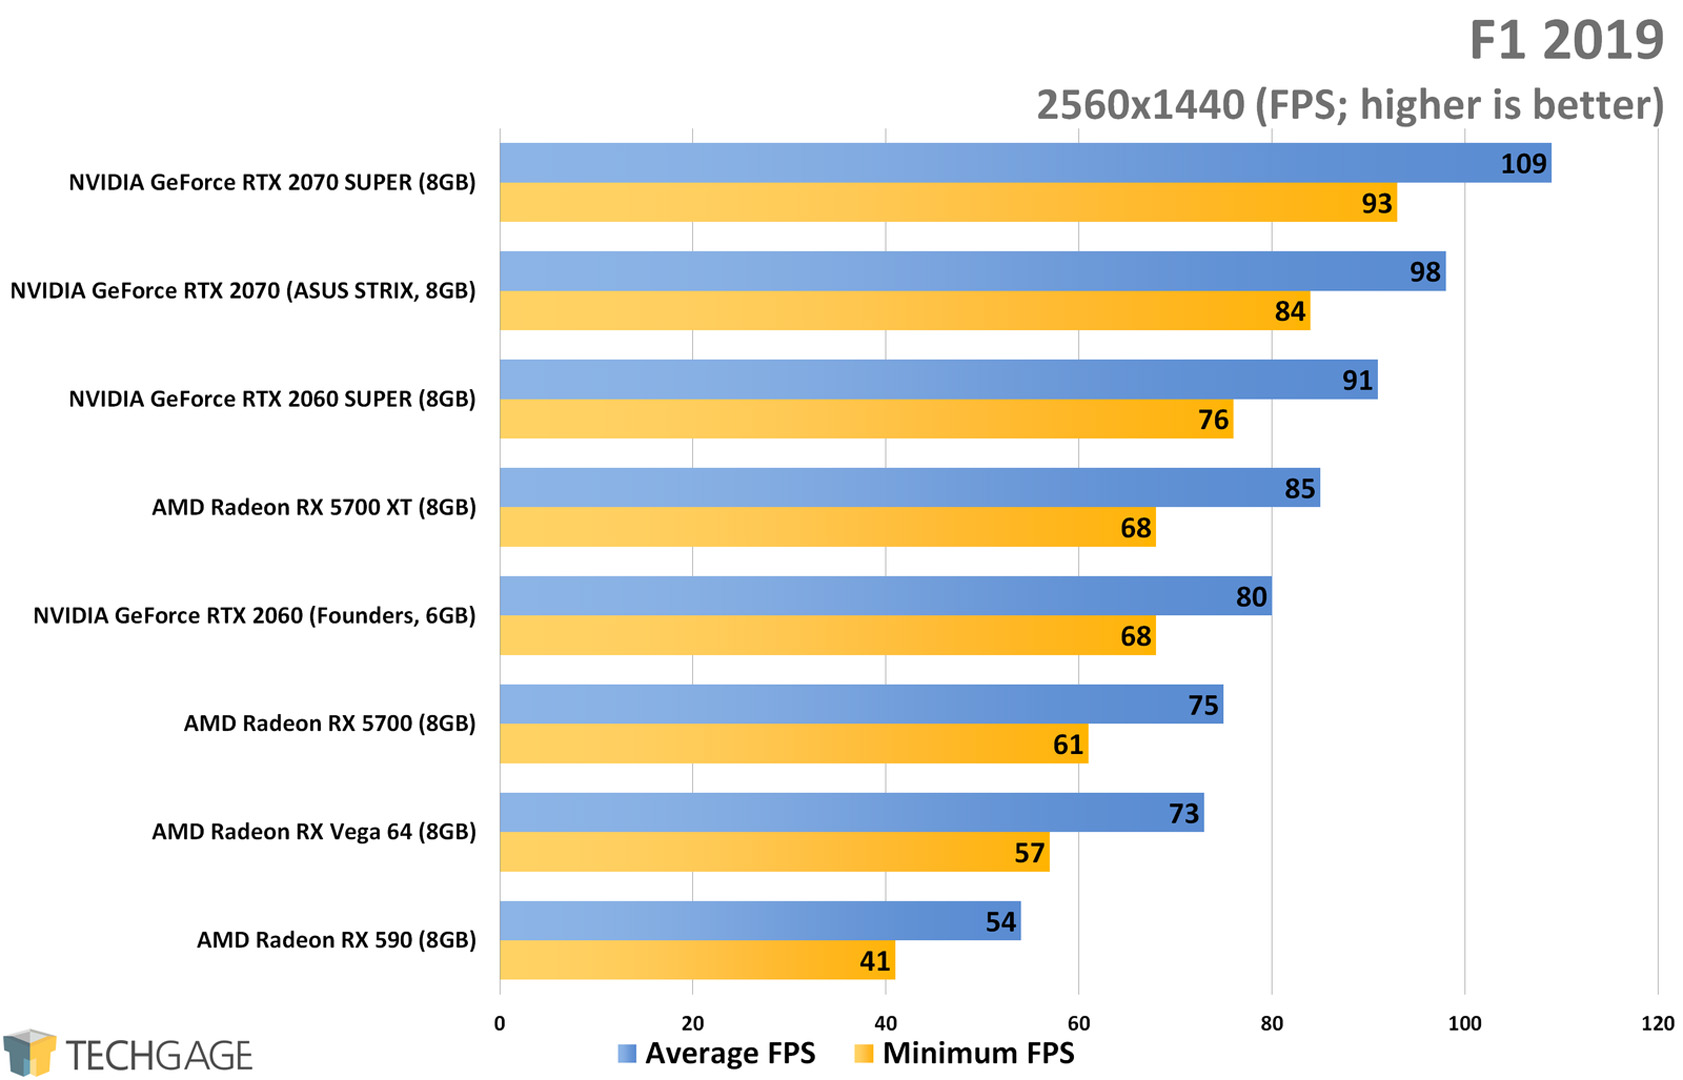 F1 2019 (1440p) - AMD Radeon RX 5700 XT and RX 5700 Performance